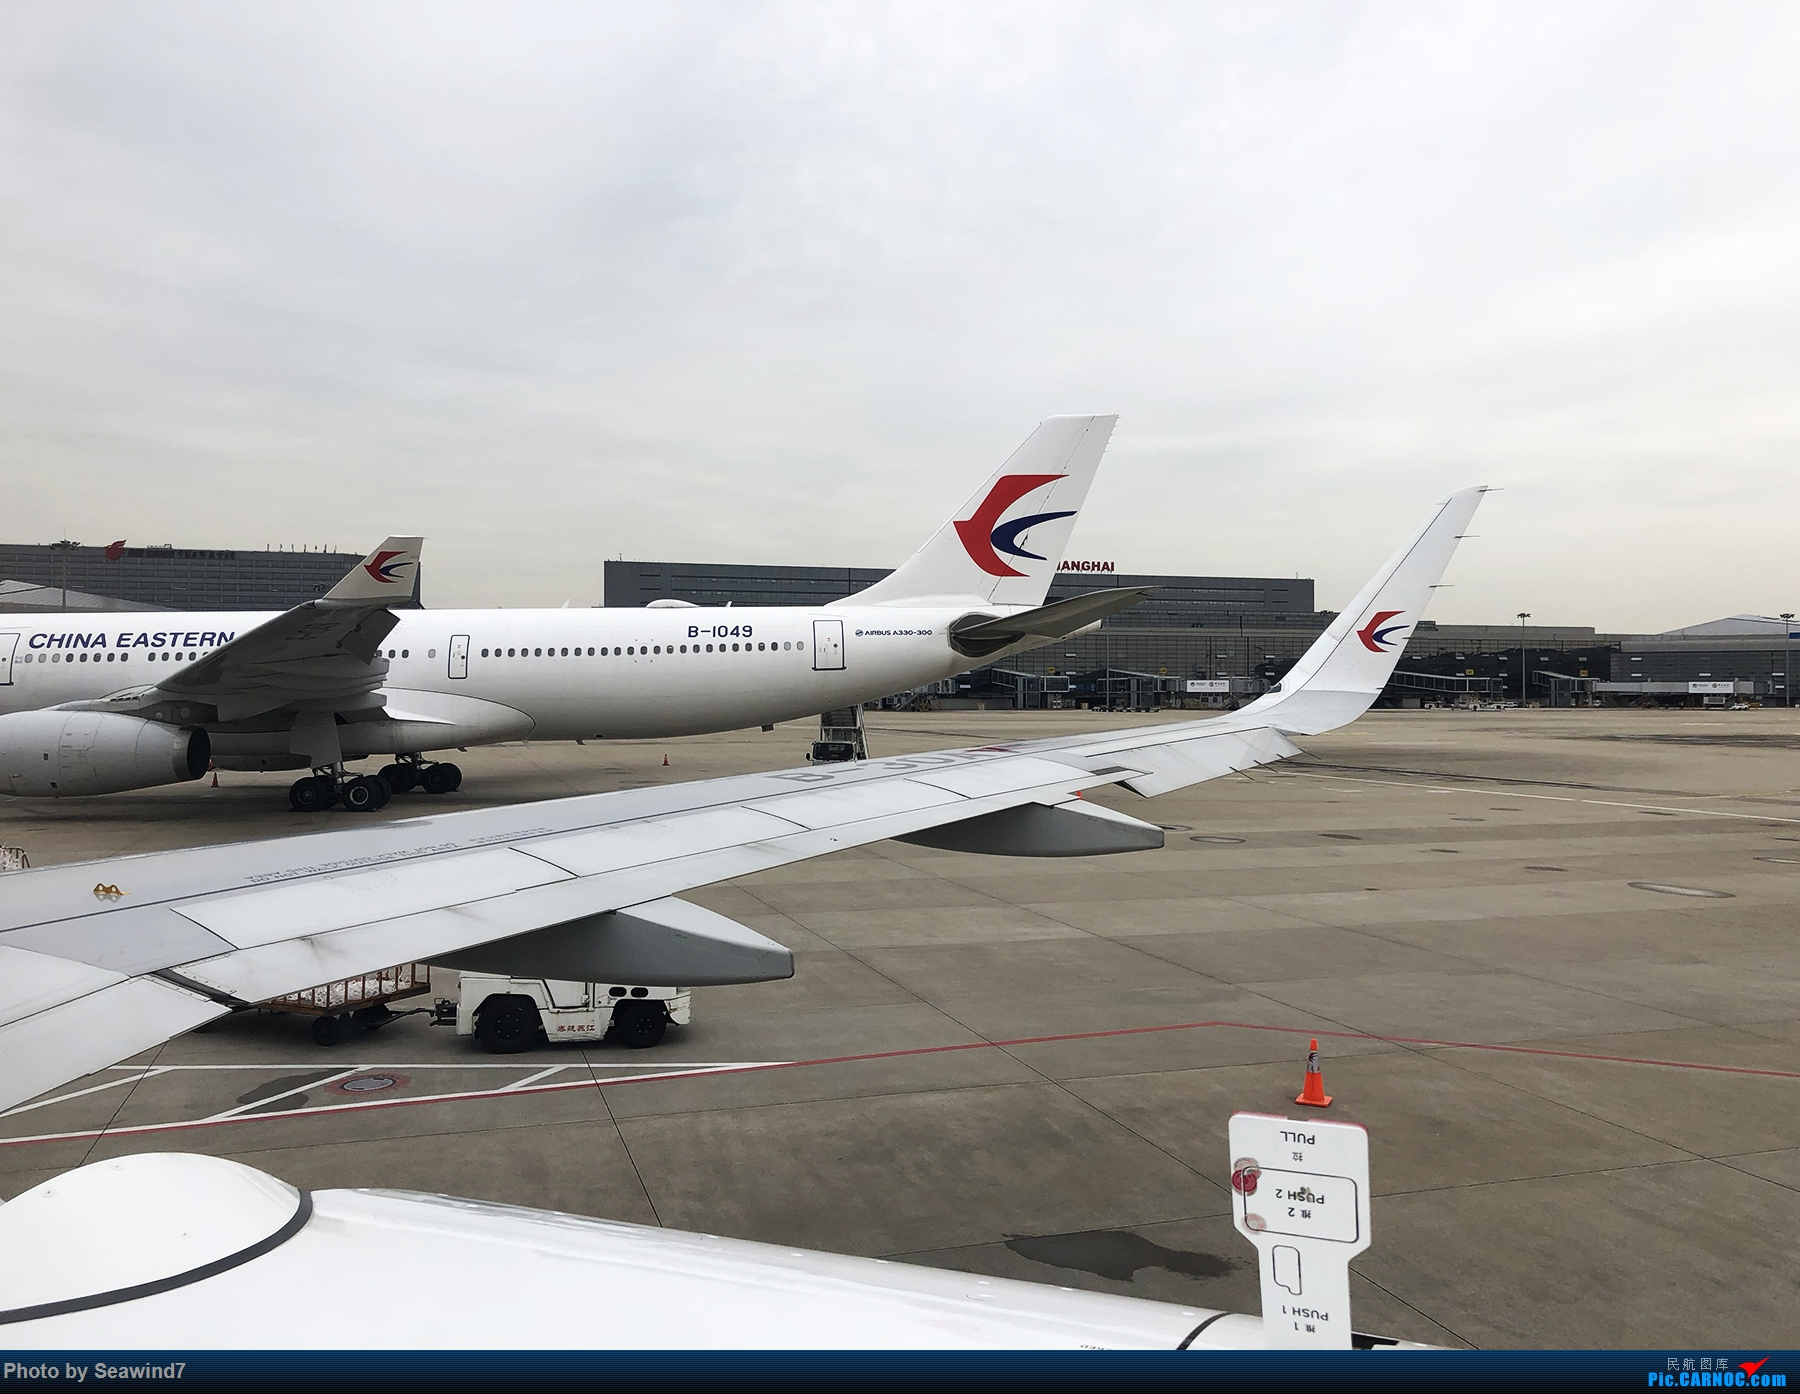 Re:[原创][Seawind7游记第五弹]银川neo往返 AIRBUS A330-300 B-1049 中国上海虹桥国际机场